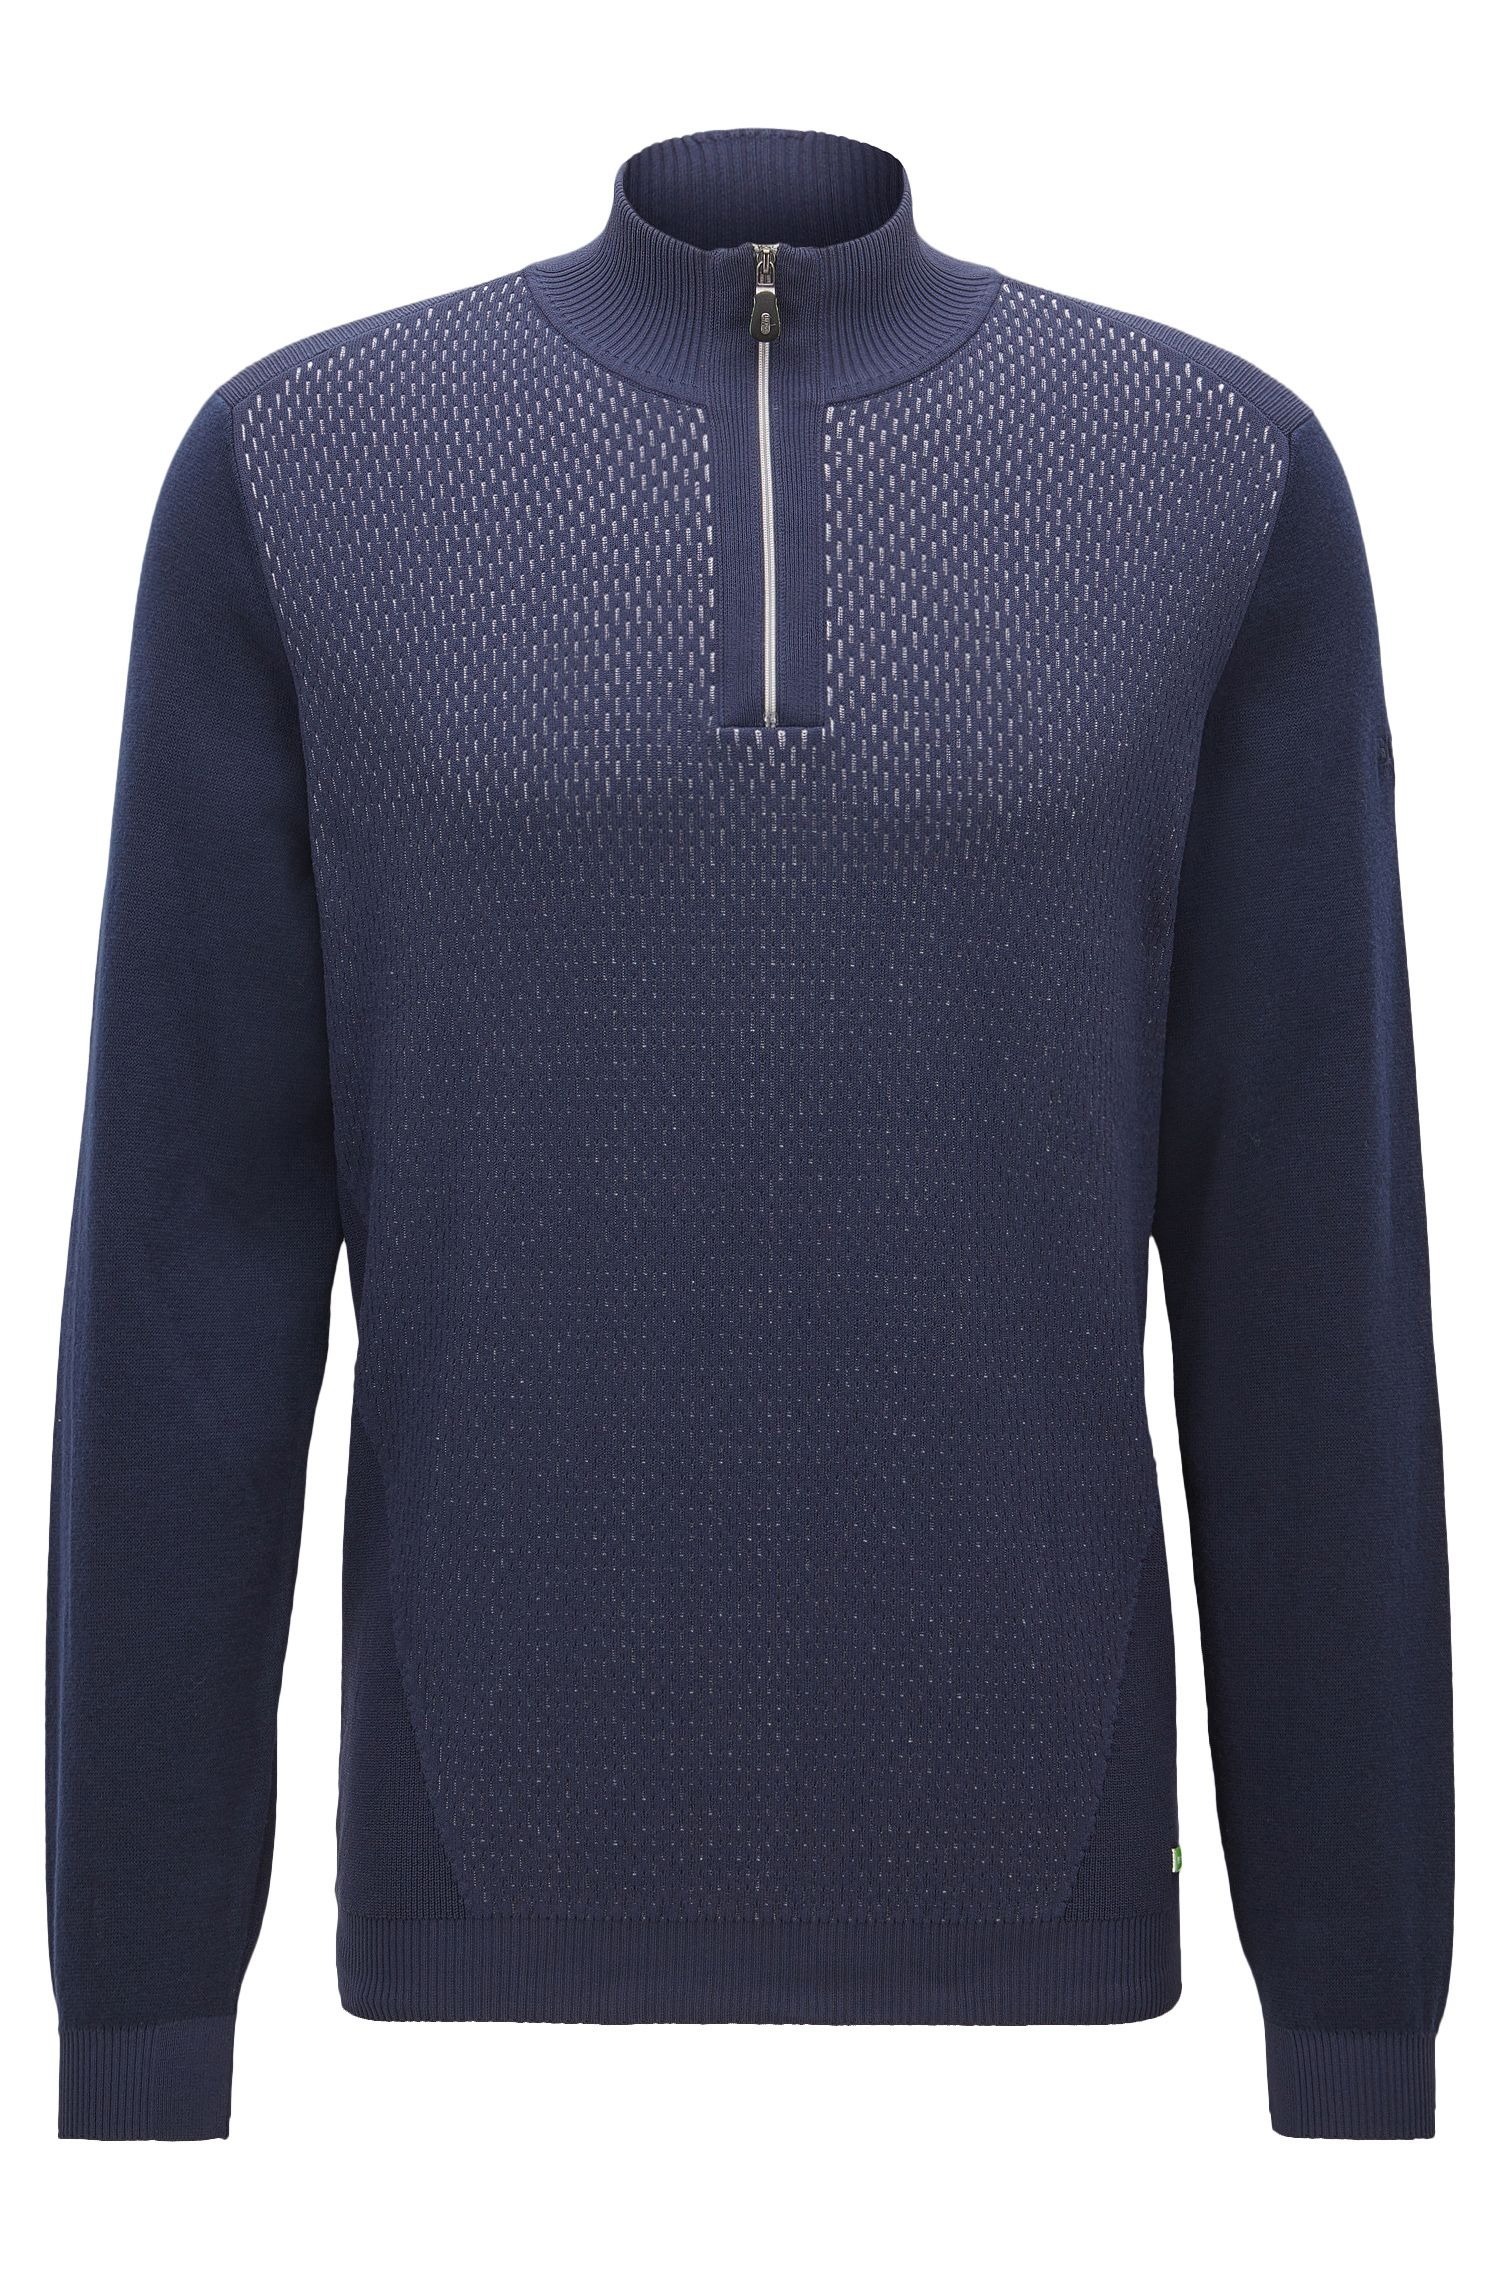 Cotton Blend Half-Zip Sweater | Zokia